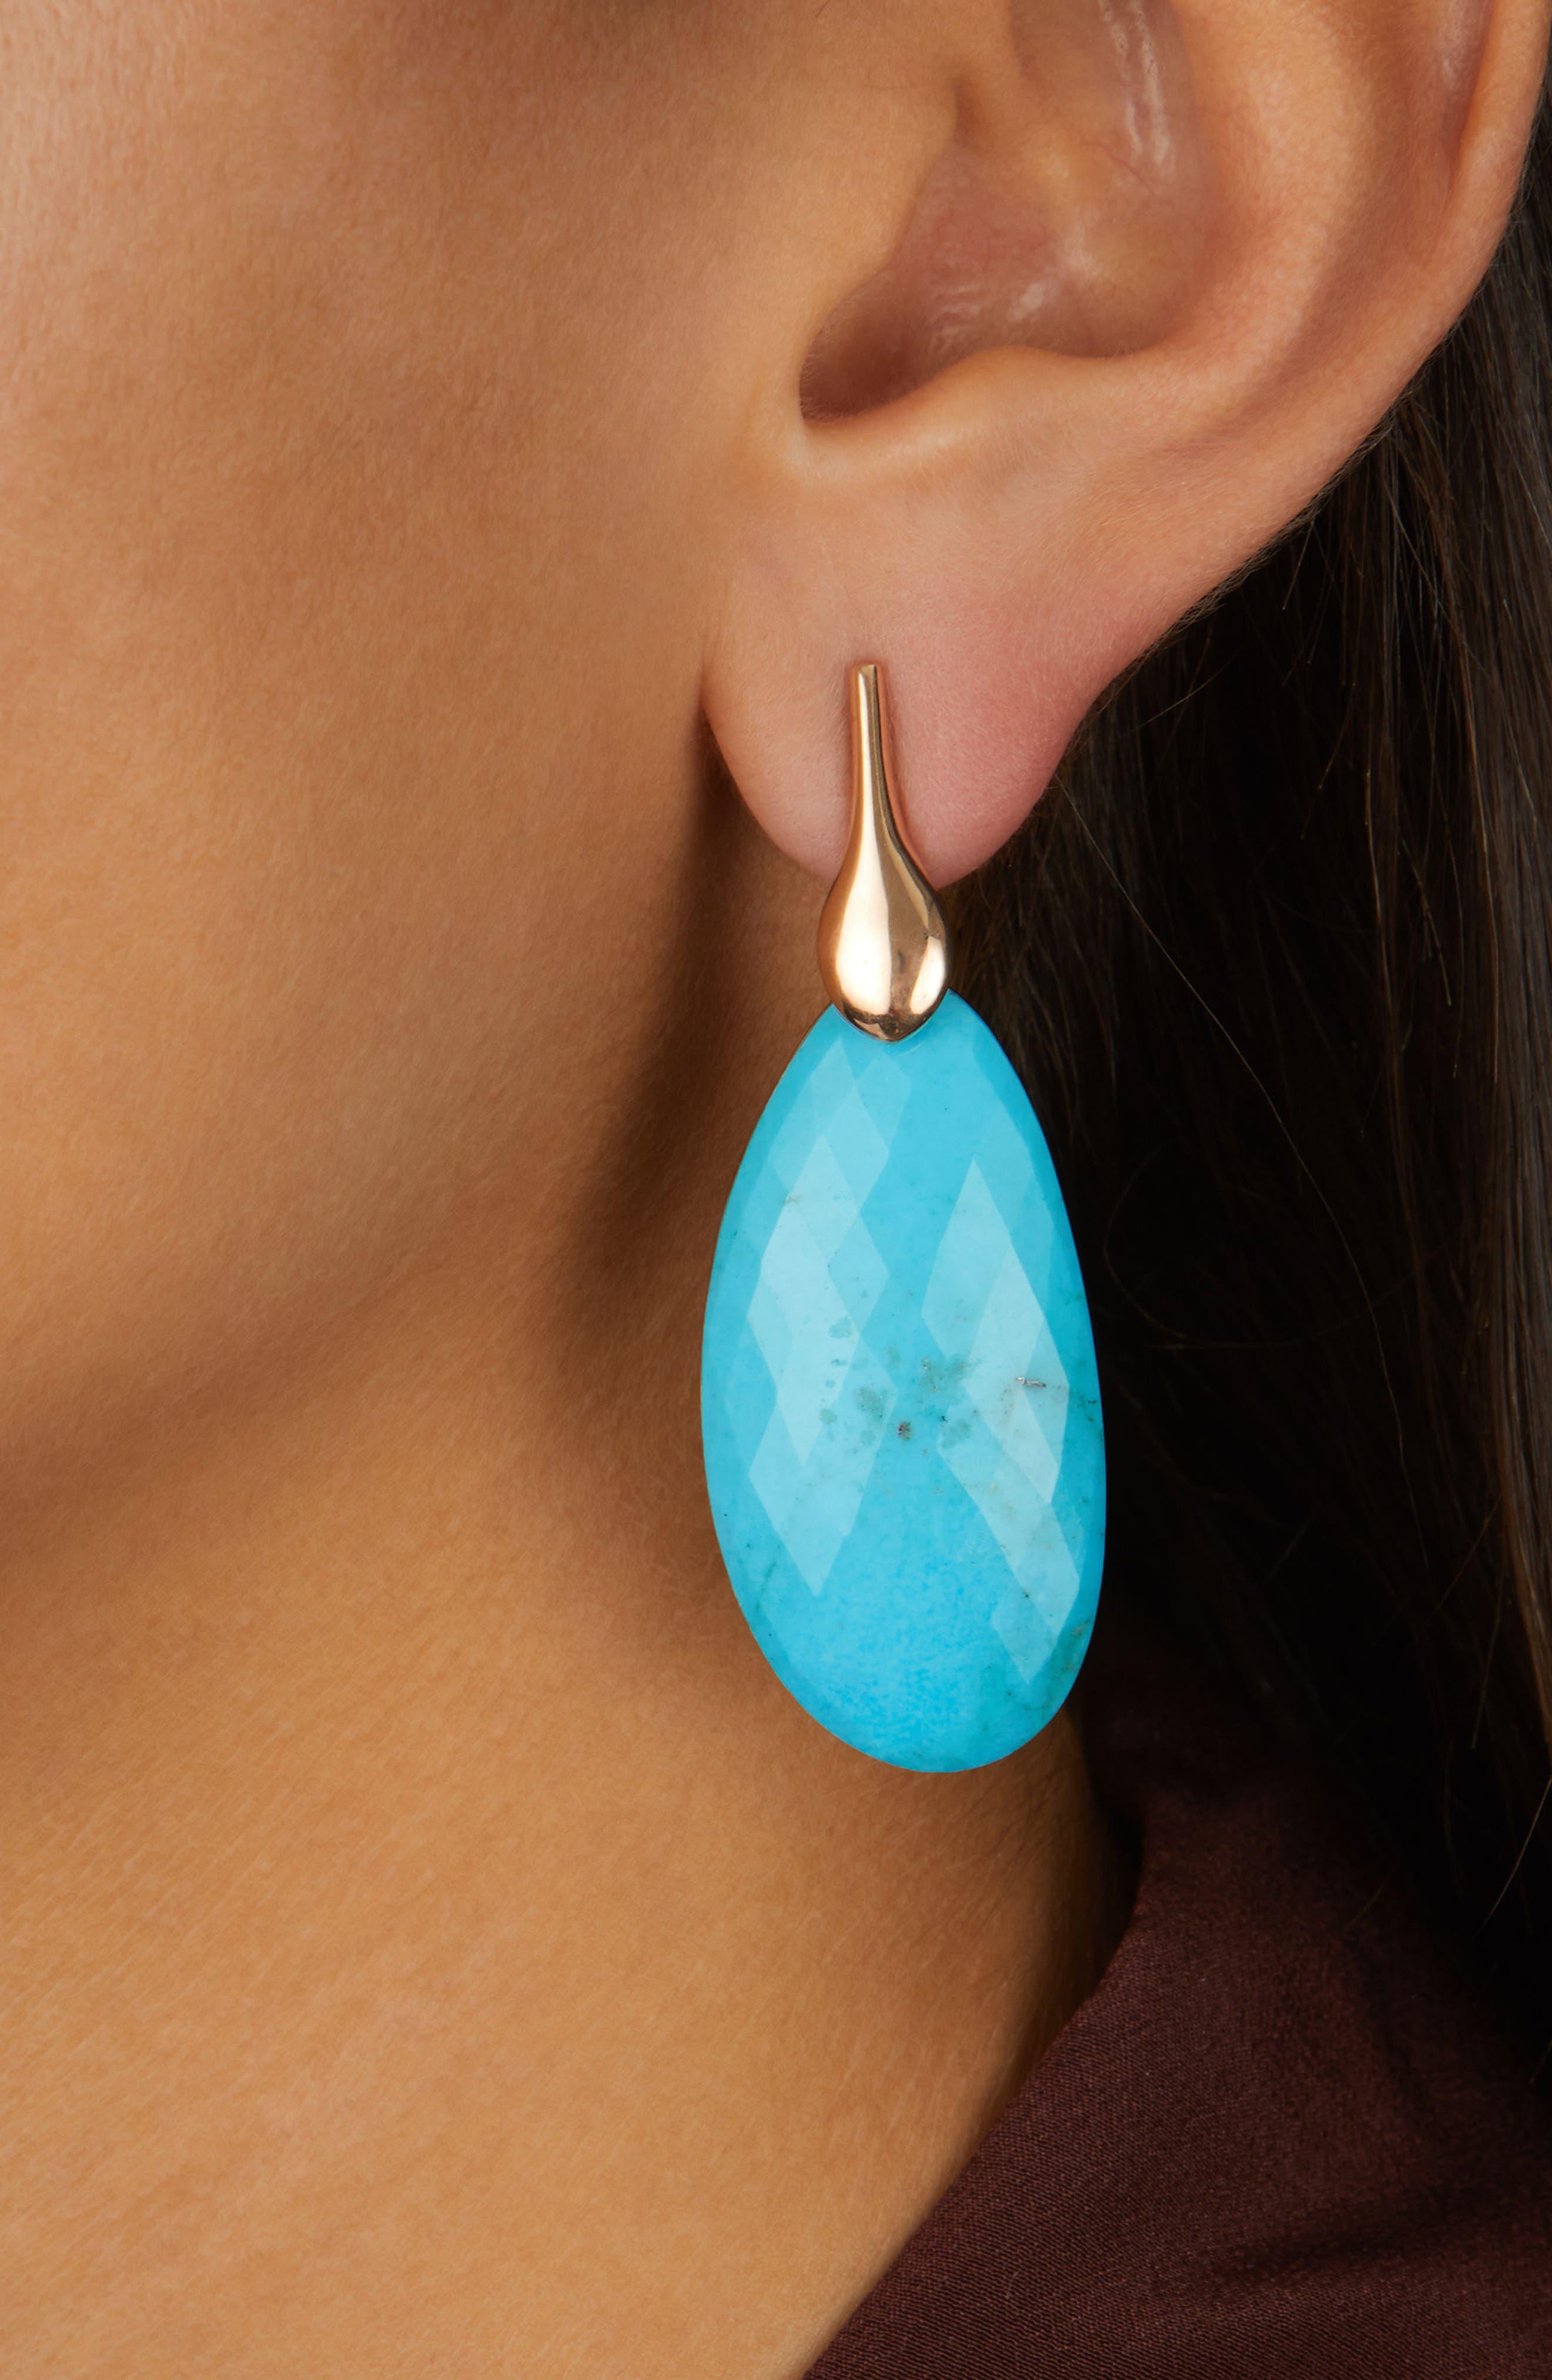 Nura Cocktail Earrings,                             Alternate thumbnail 3, color,                             Turquoise